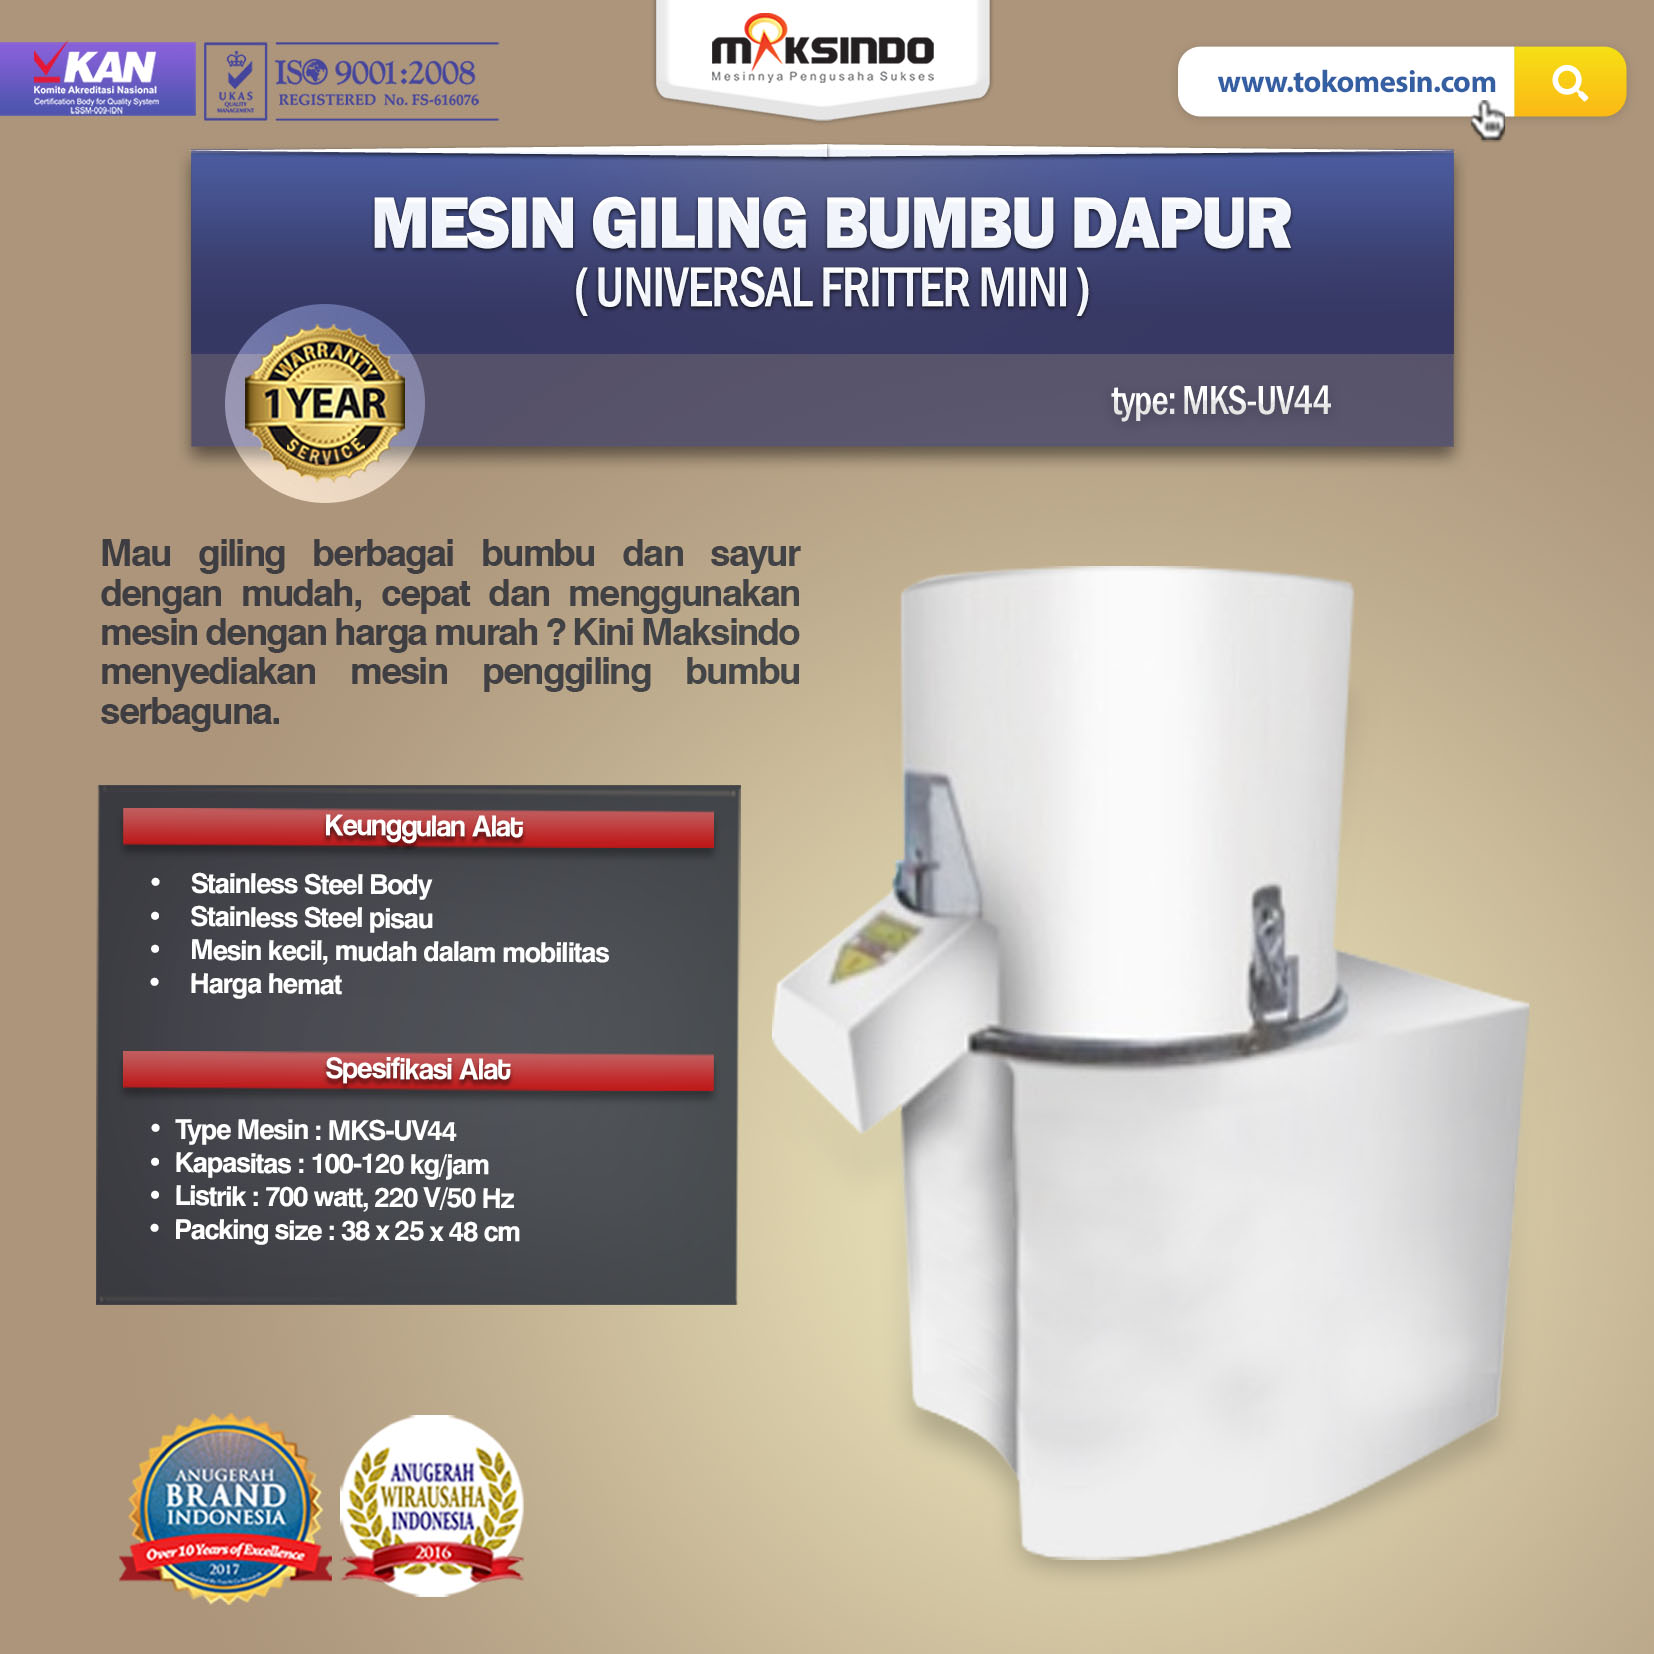 Jual Mesin Giling Bumbu Dapur (Universal Fritter Mini) MKS-UV44 di Semarang